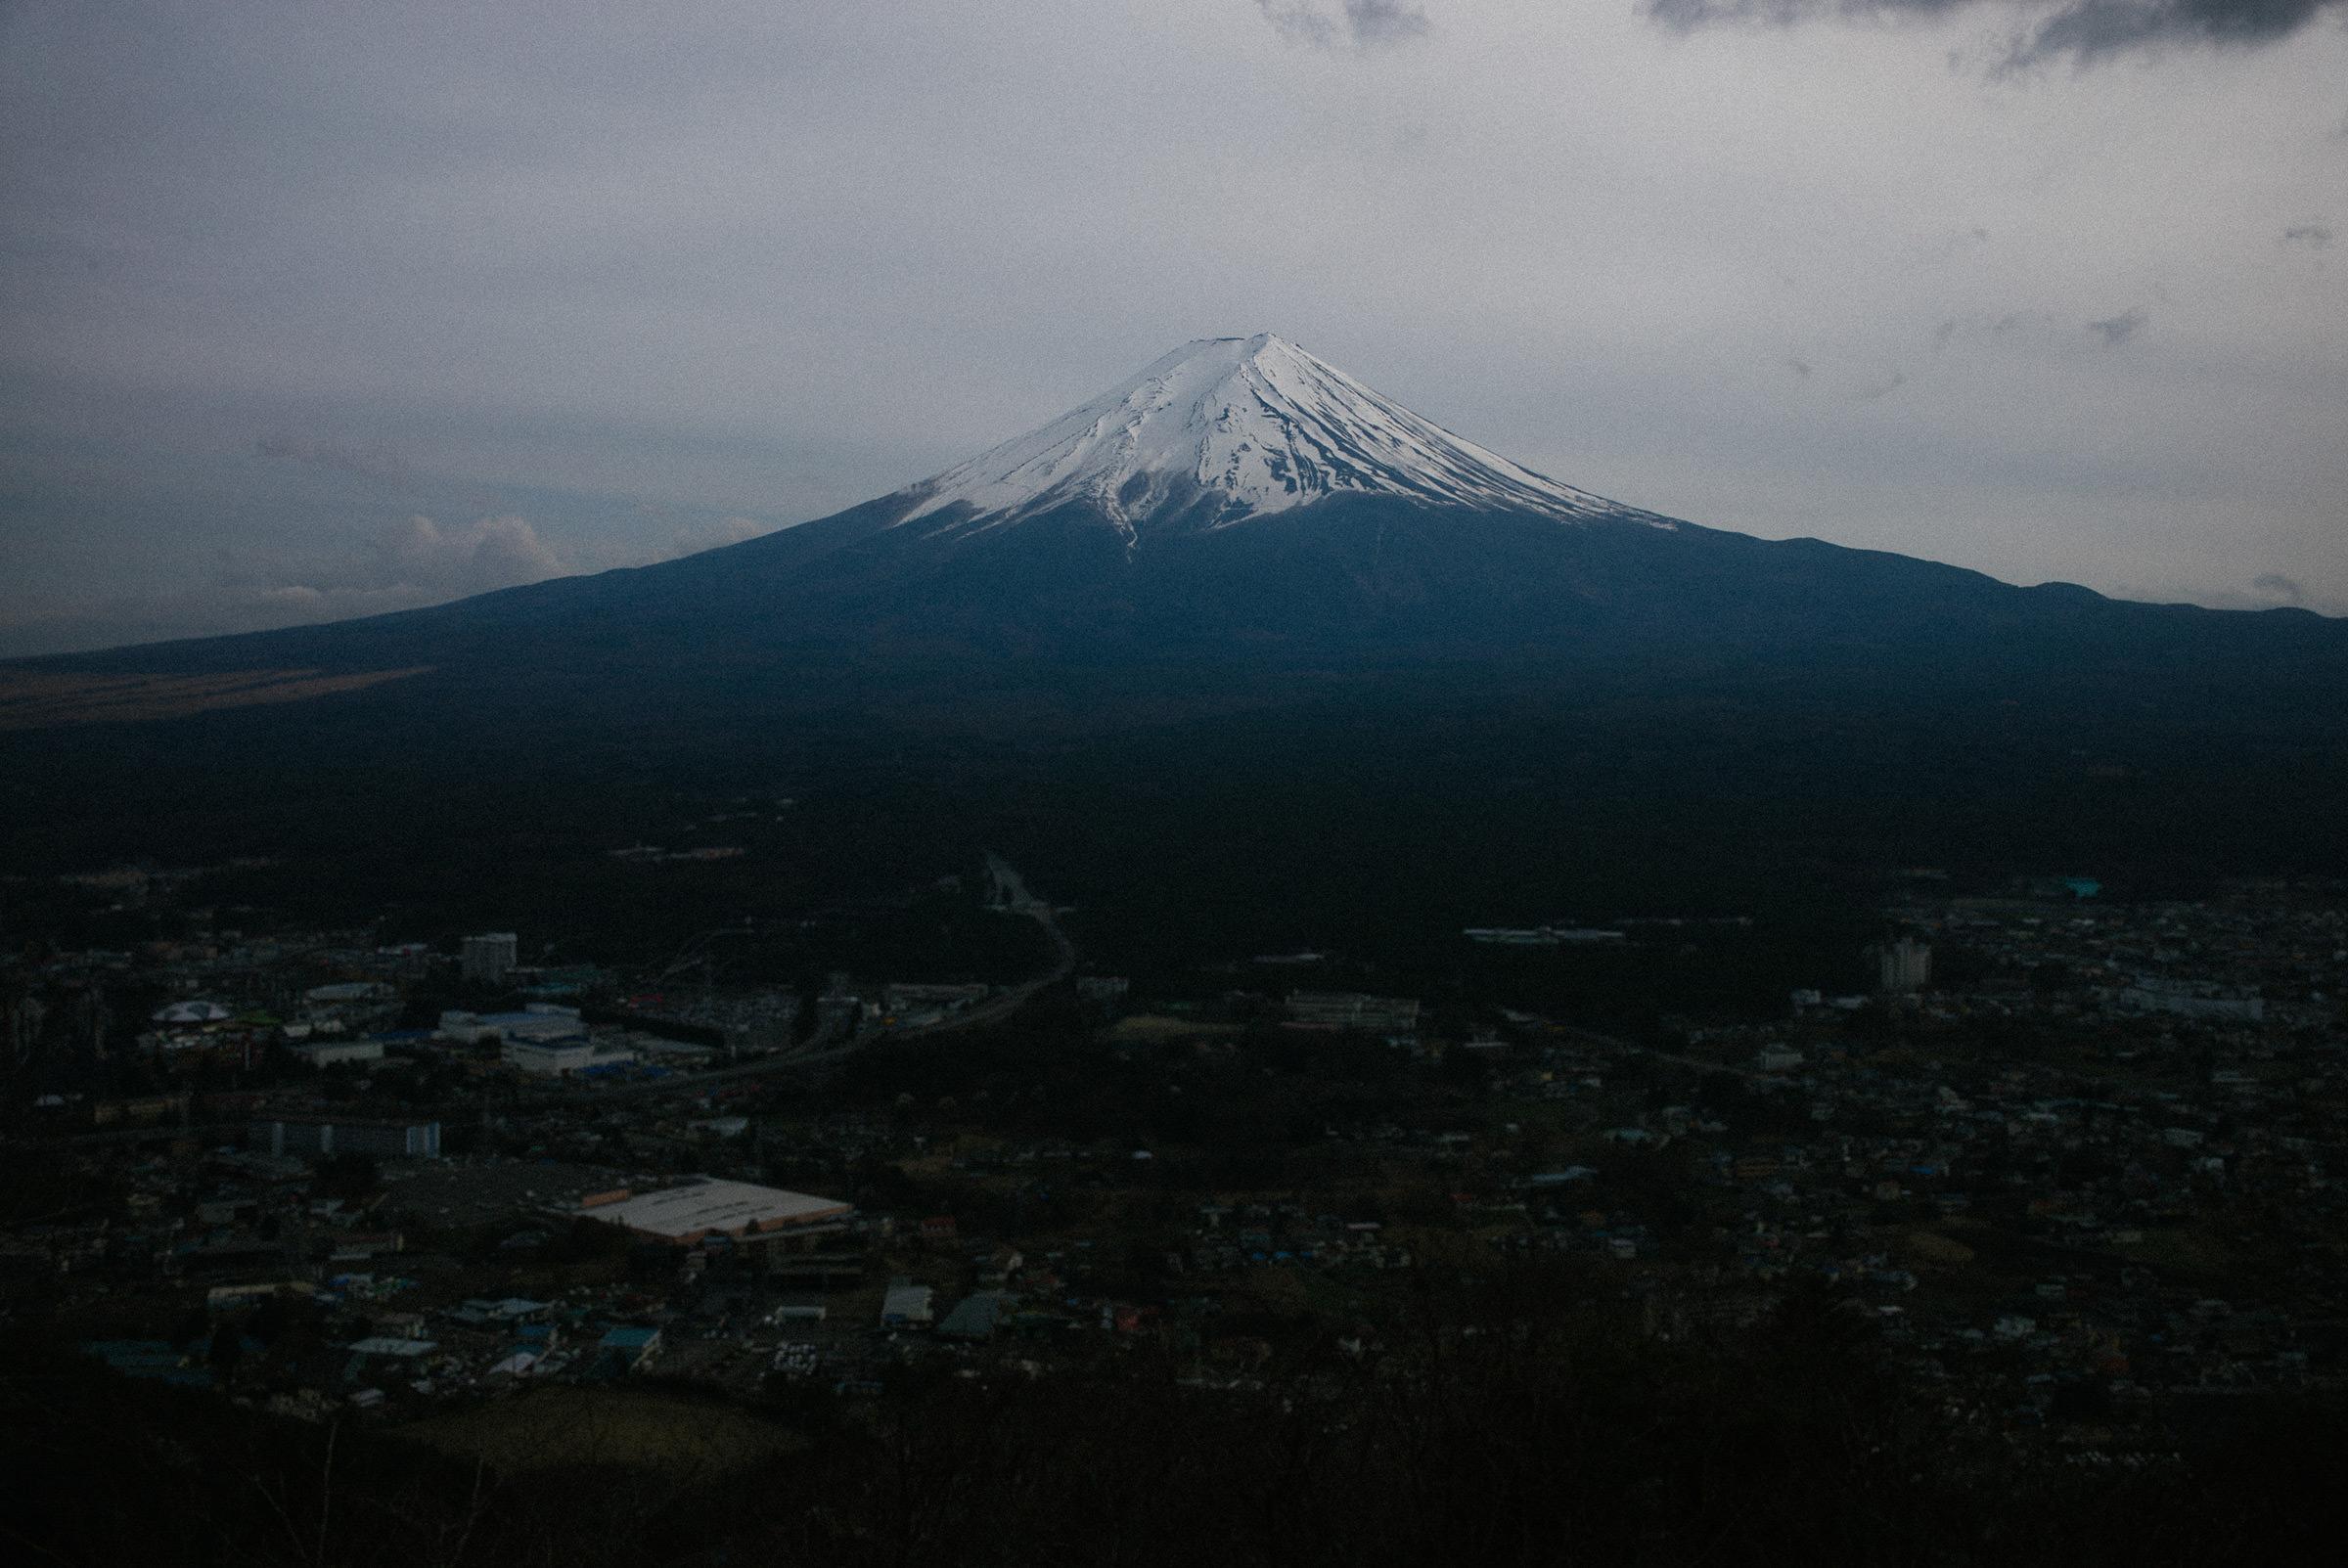 brandon_patoc_travel_japan_worldwide_photographer0025.jpg